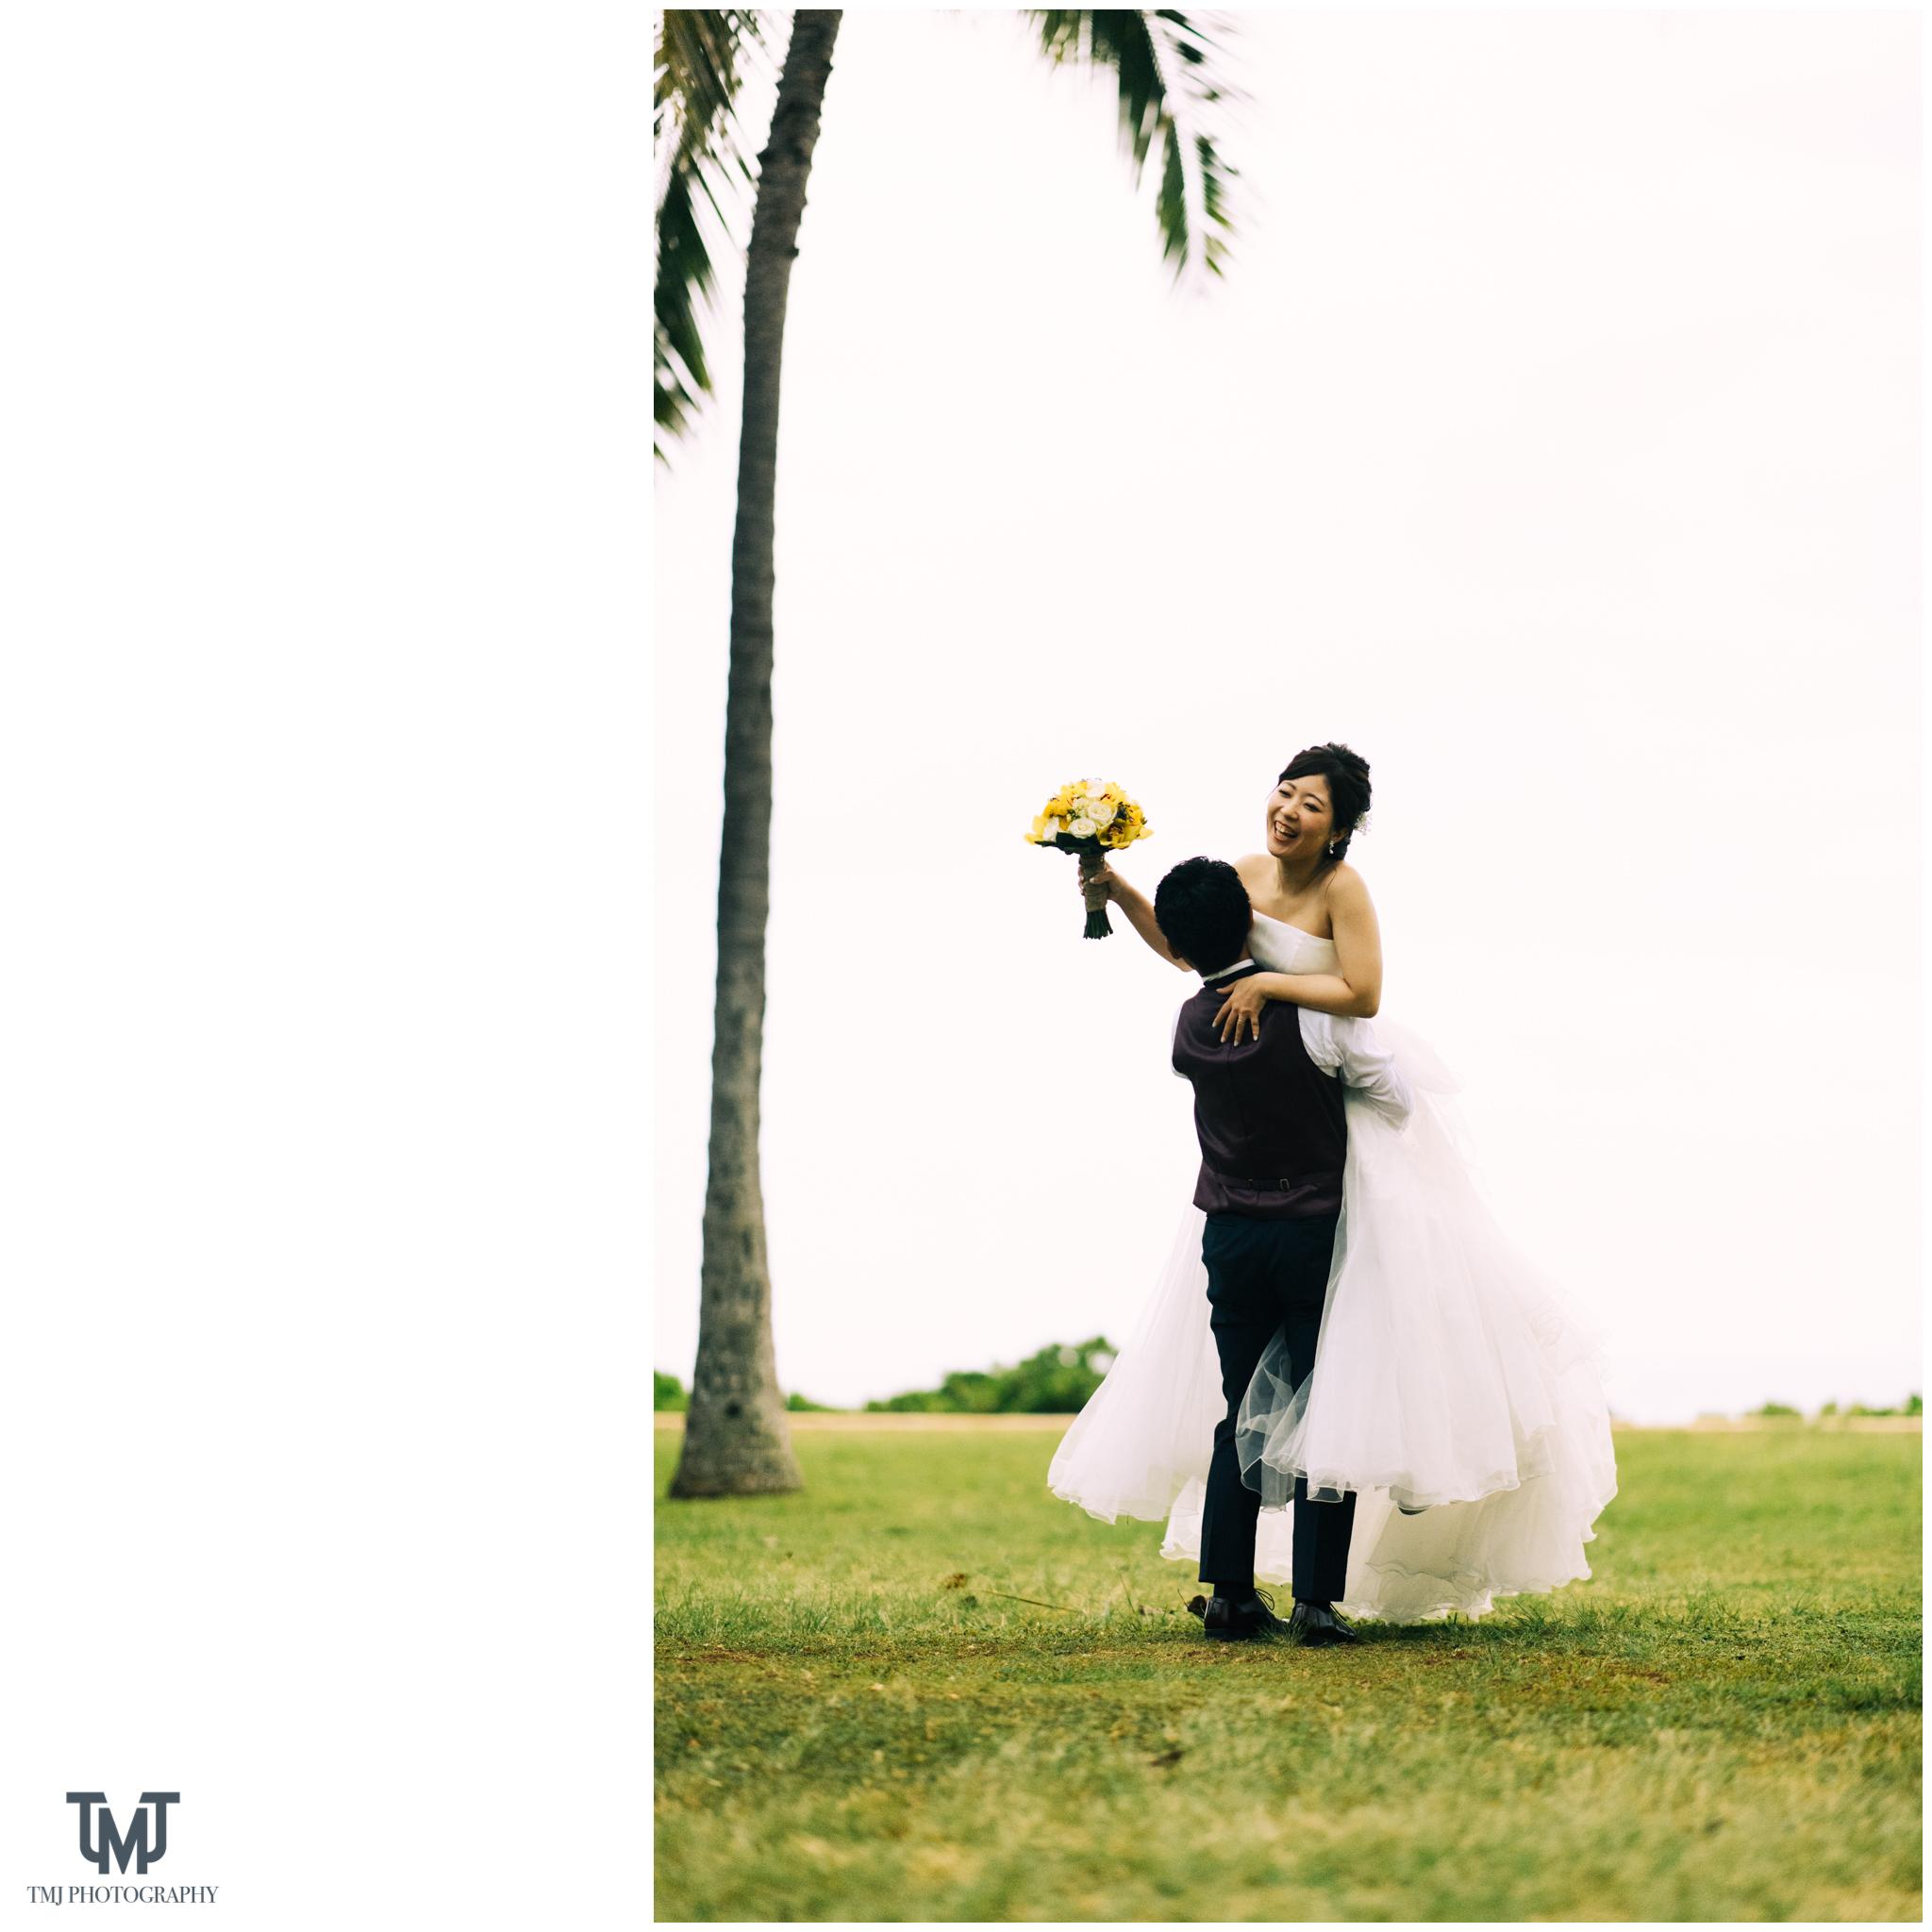 Moana Surfrider Terrace By The Sea Honolulu Destination Wedding 070.jpg